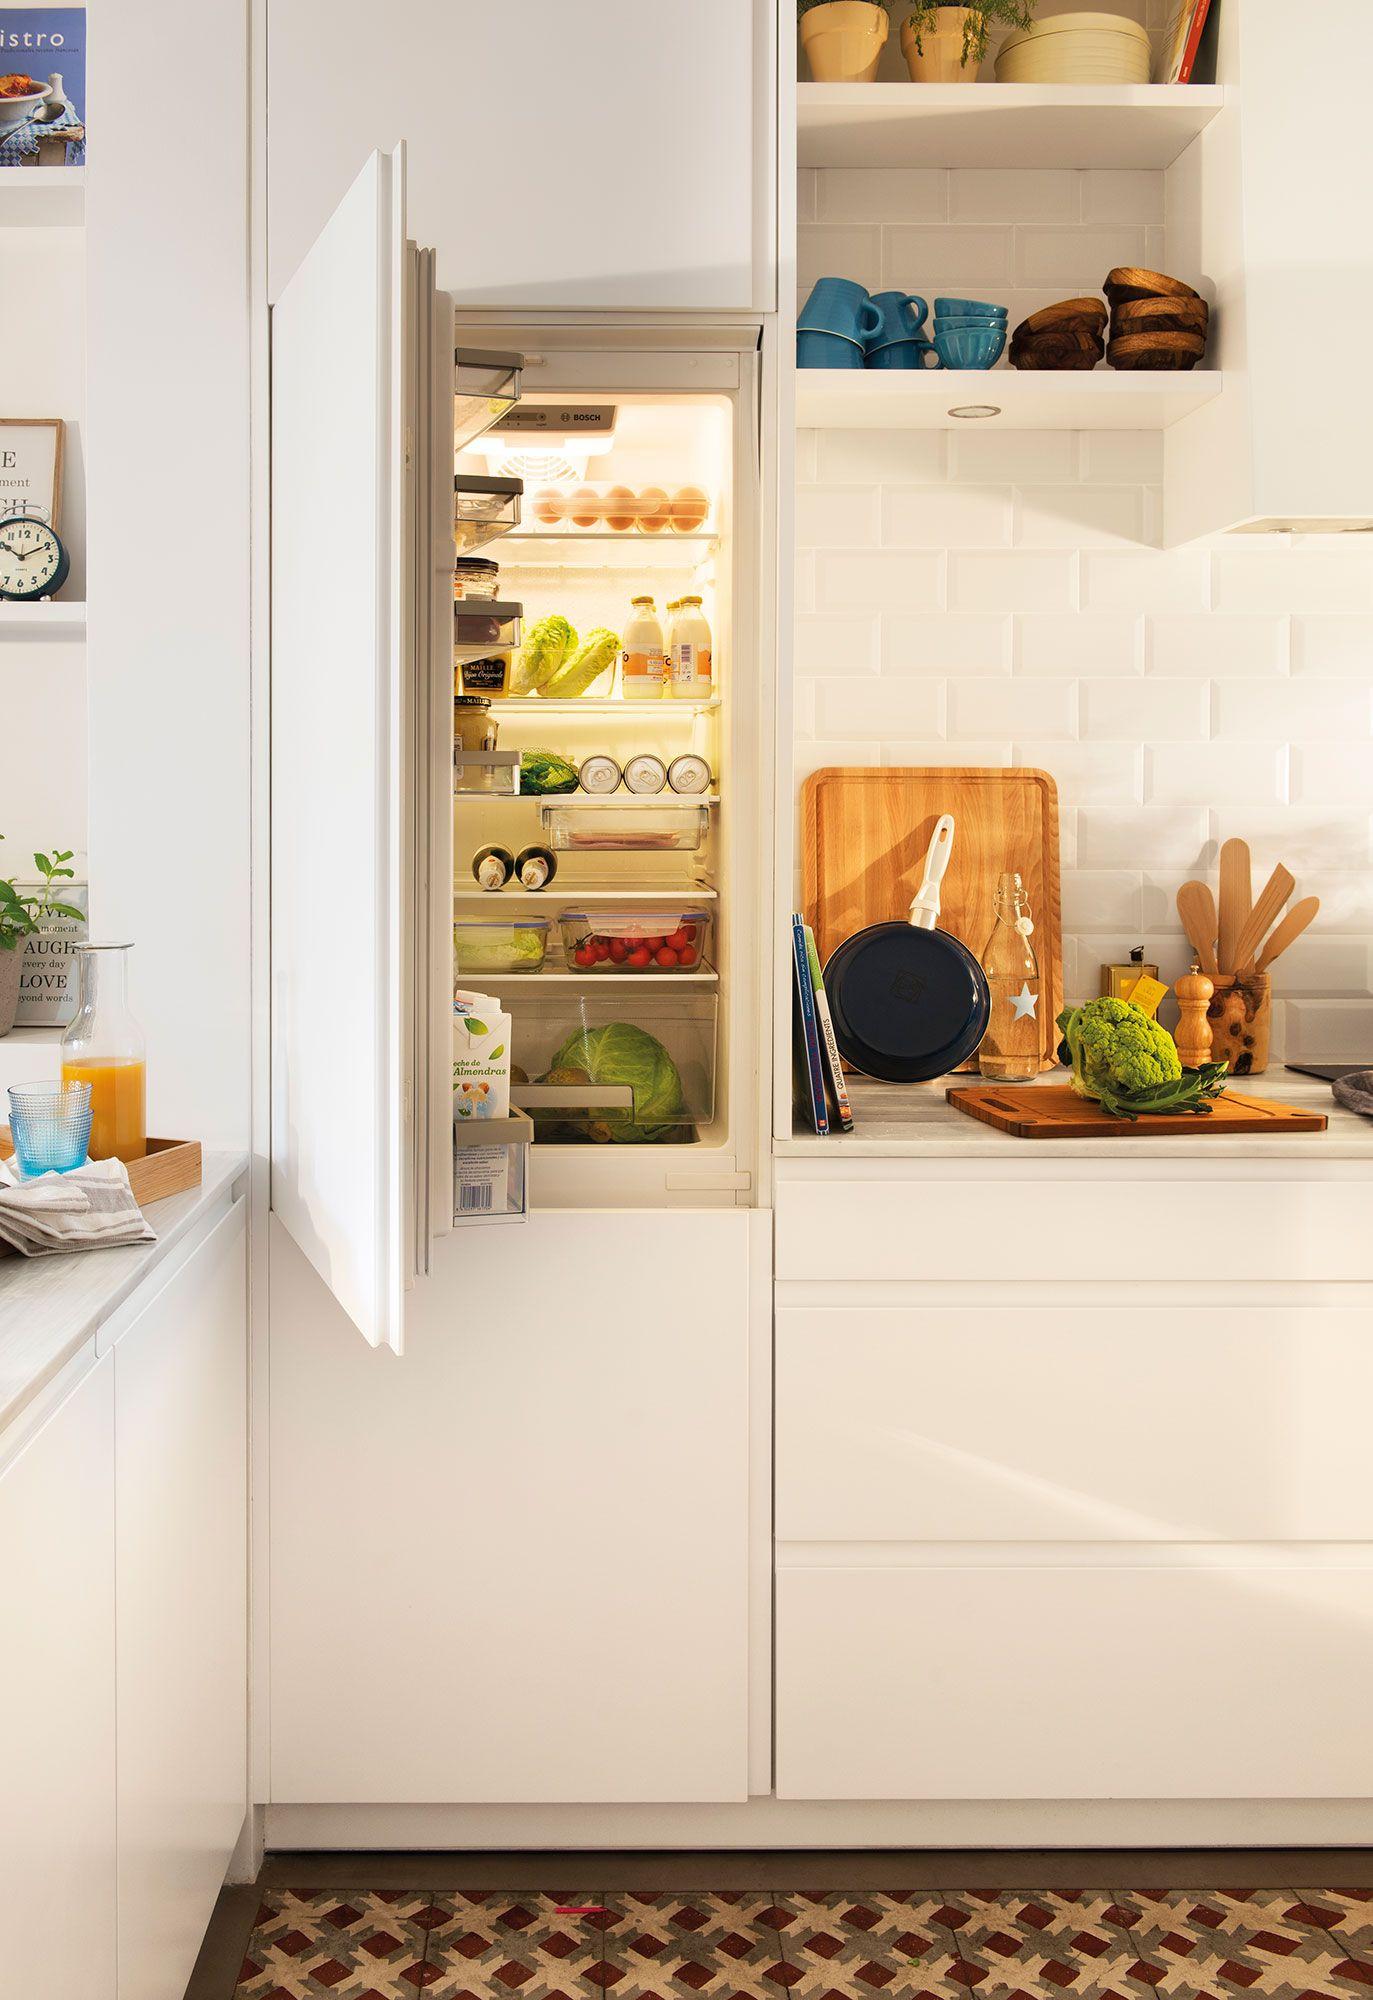 Semitoma de cocina en blanco con armarios cocinas en for Medidas nevera pequena